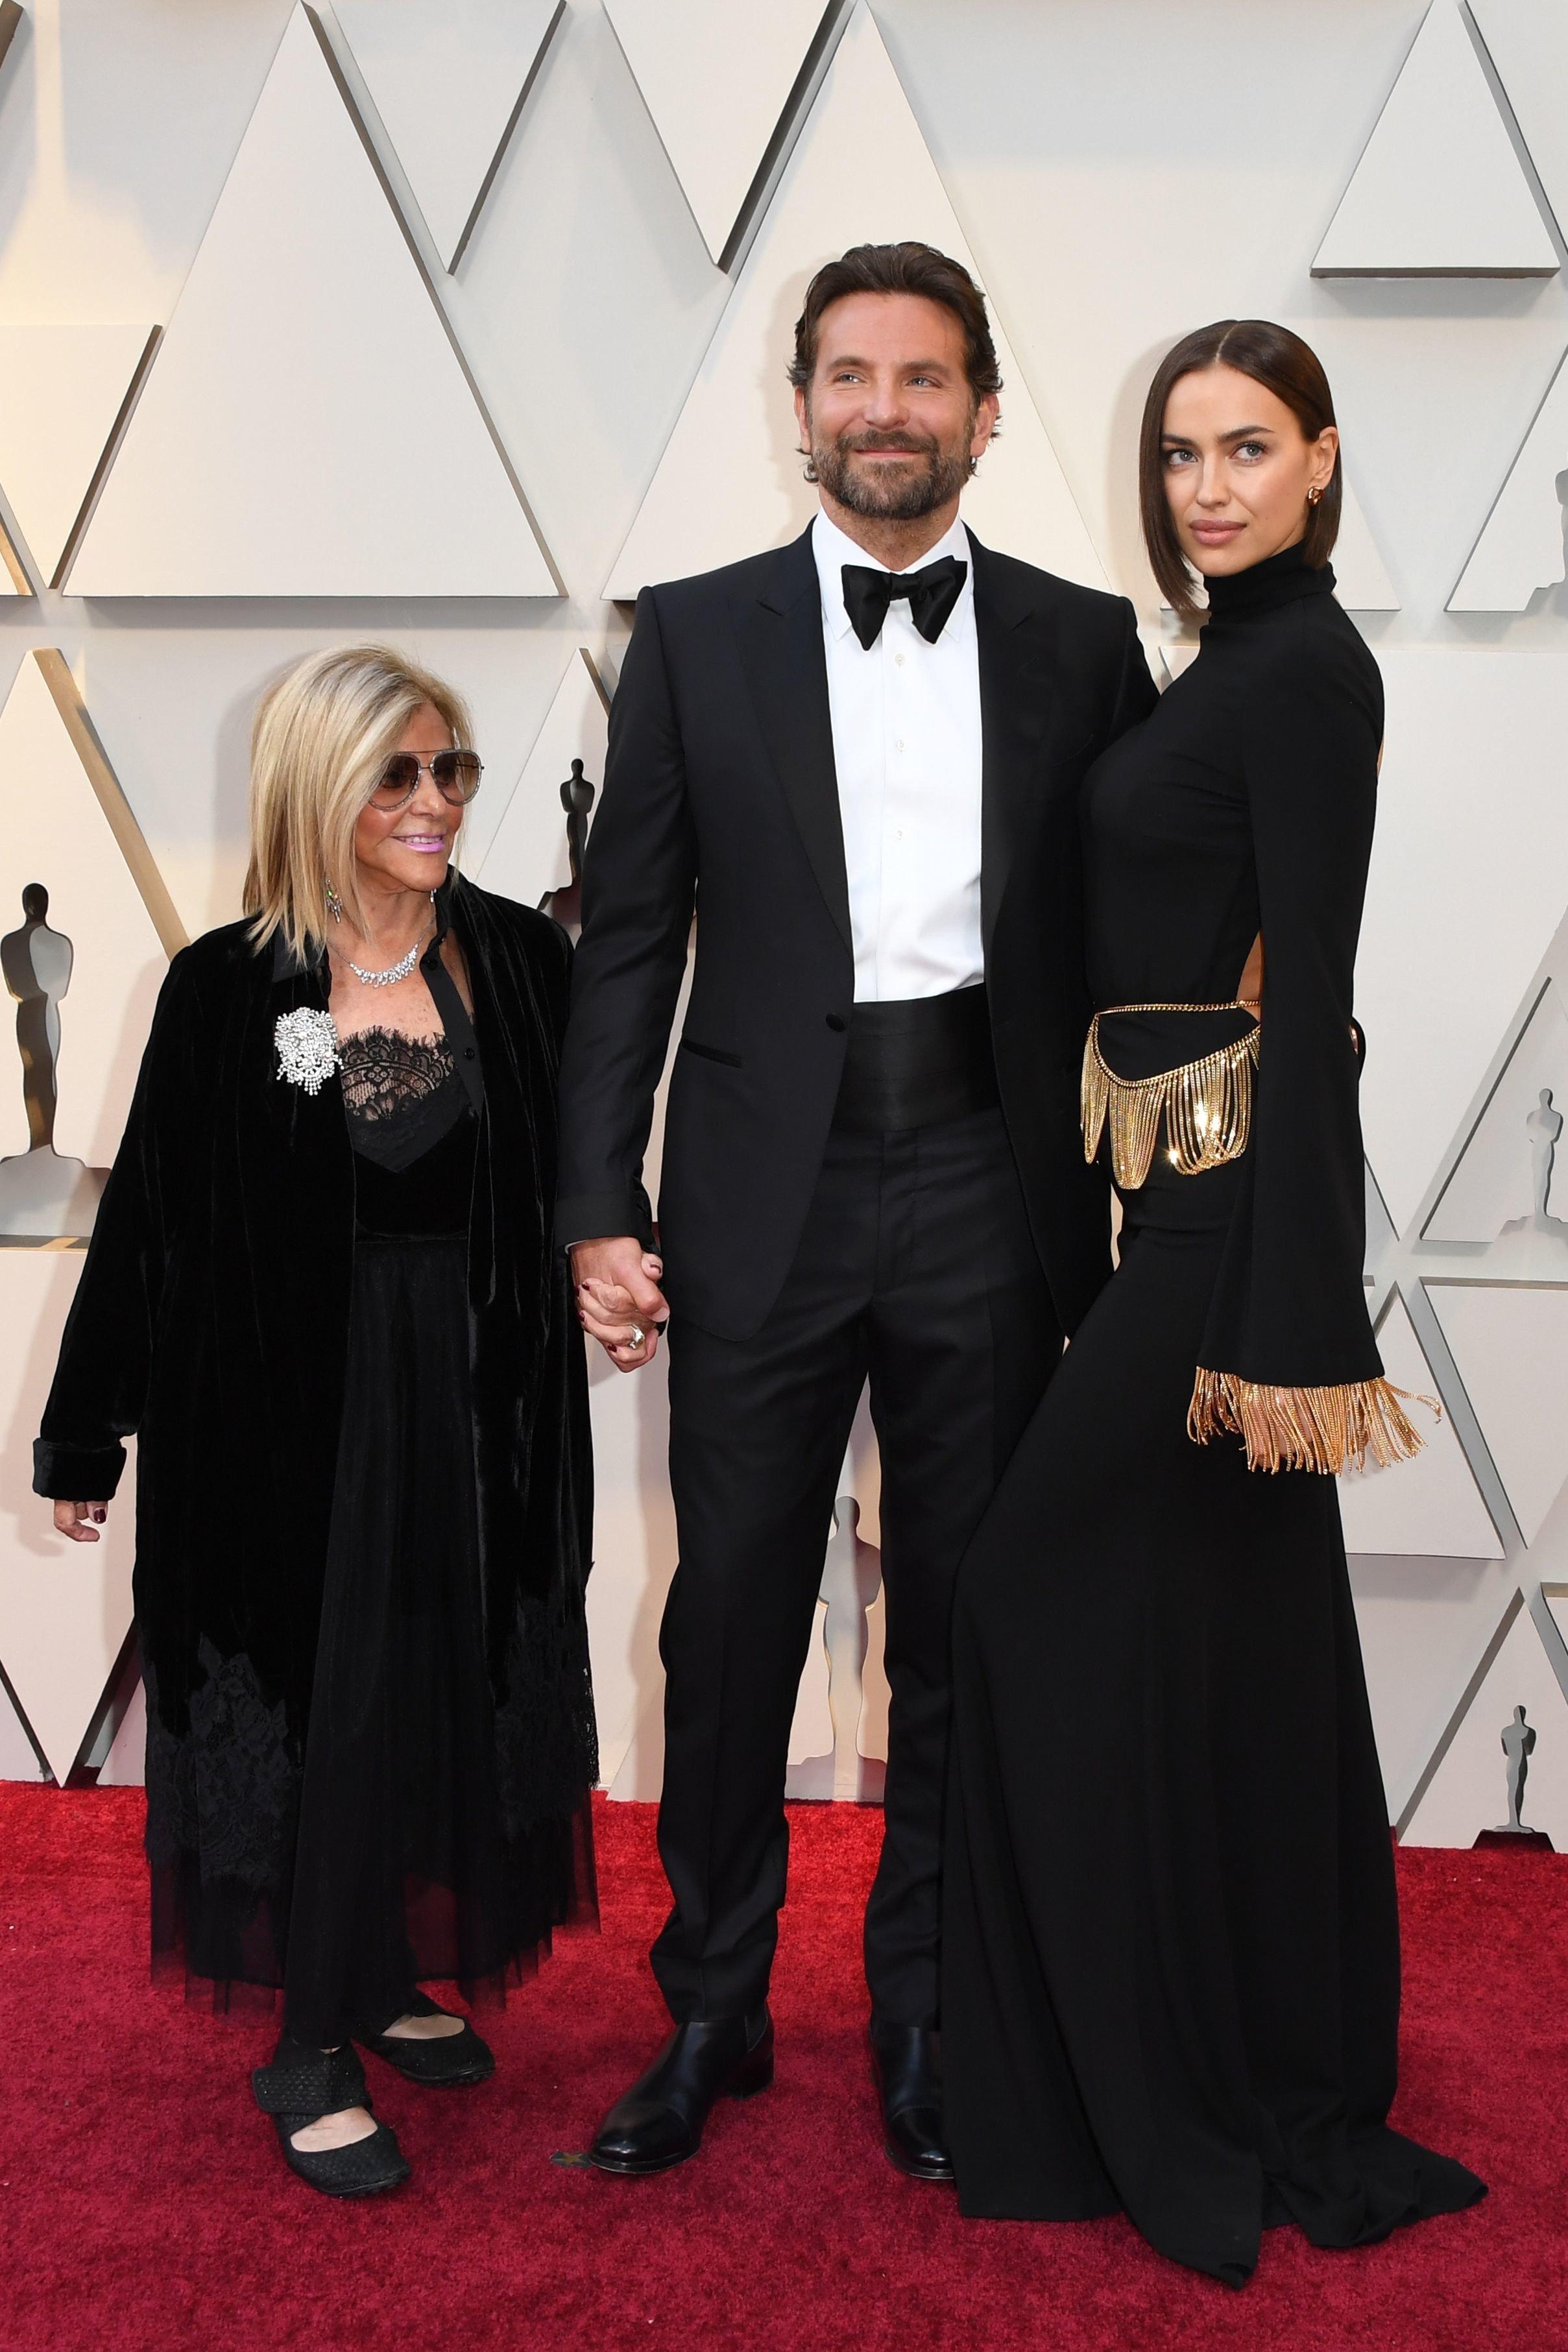 Bradley Cooper and Irina Shayk arrive at the 2019 Oscars.